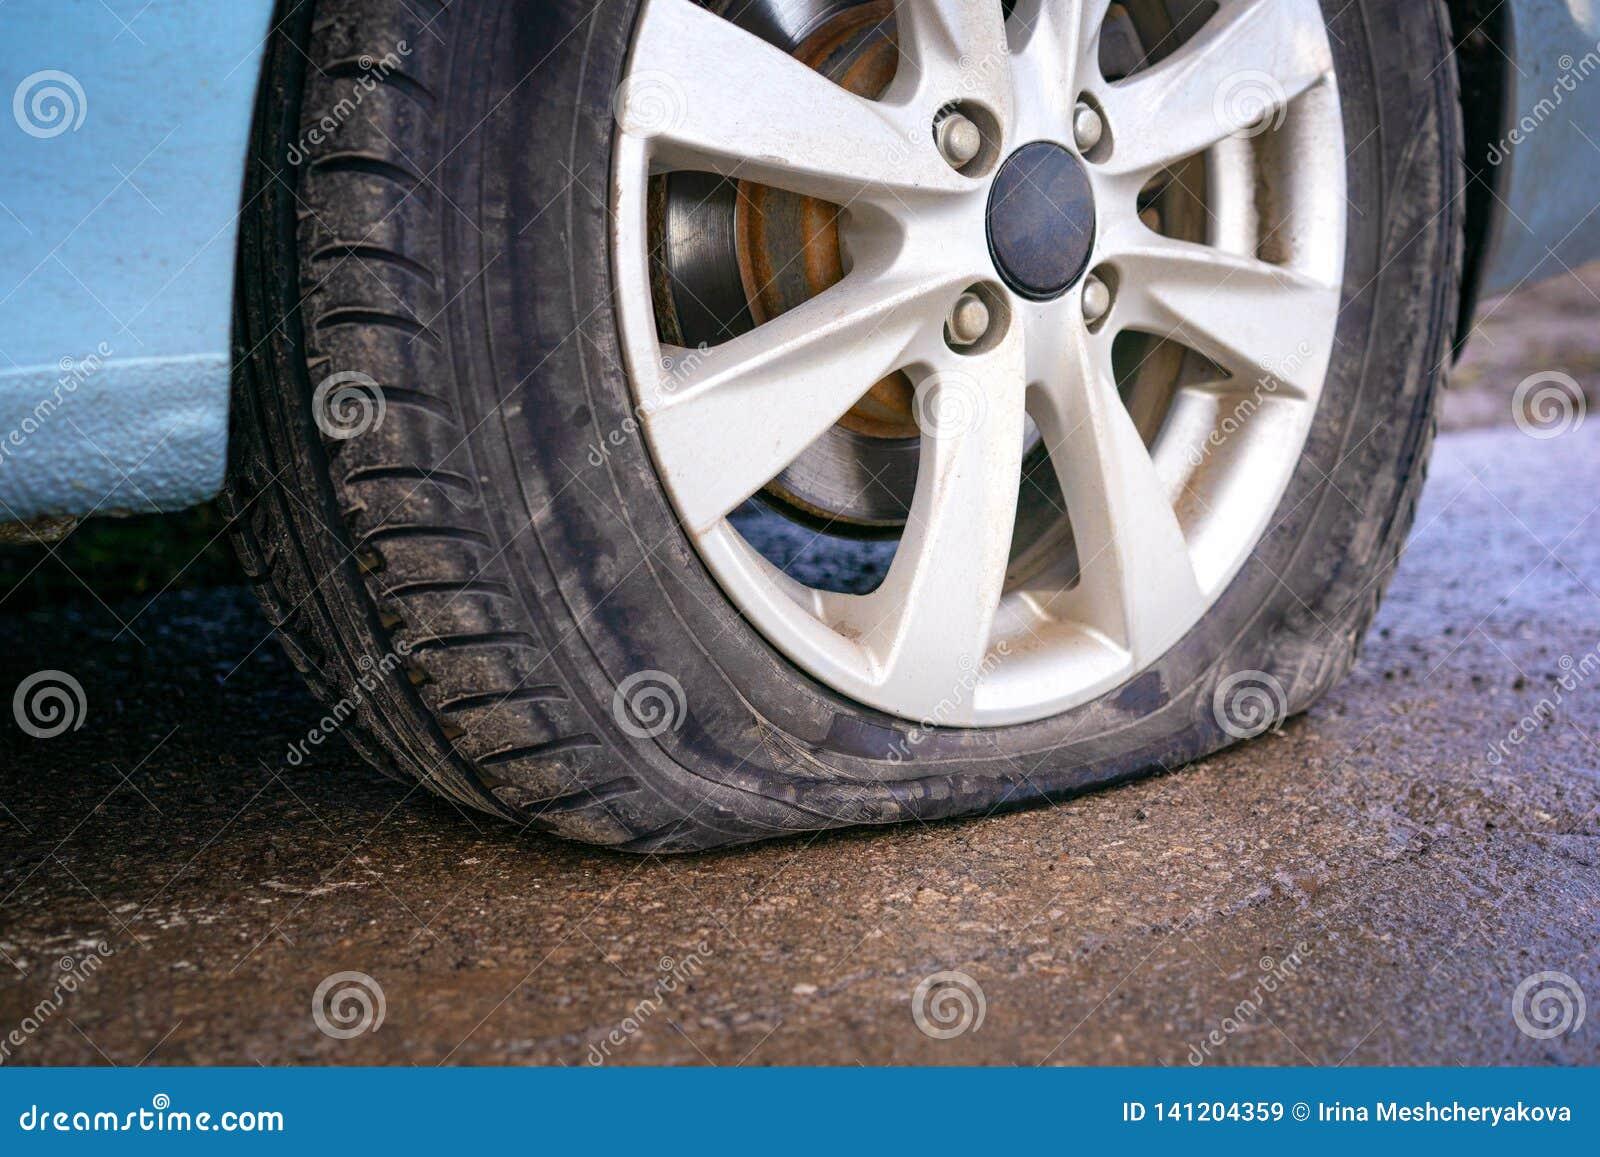 Nail In Tire Repair >> Flat Tire Of Blue Car On The Road Waiting For Repair Car Tire Leak